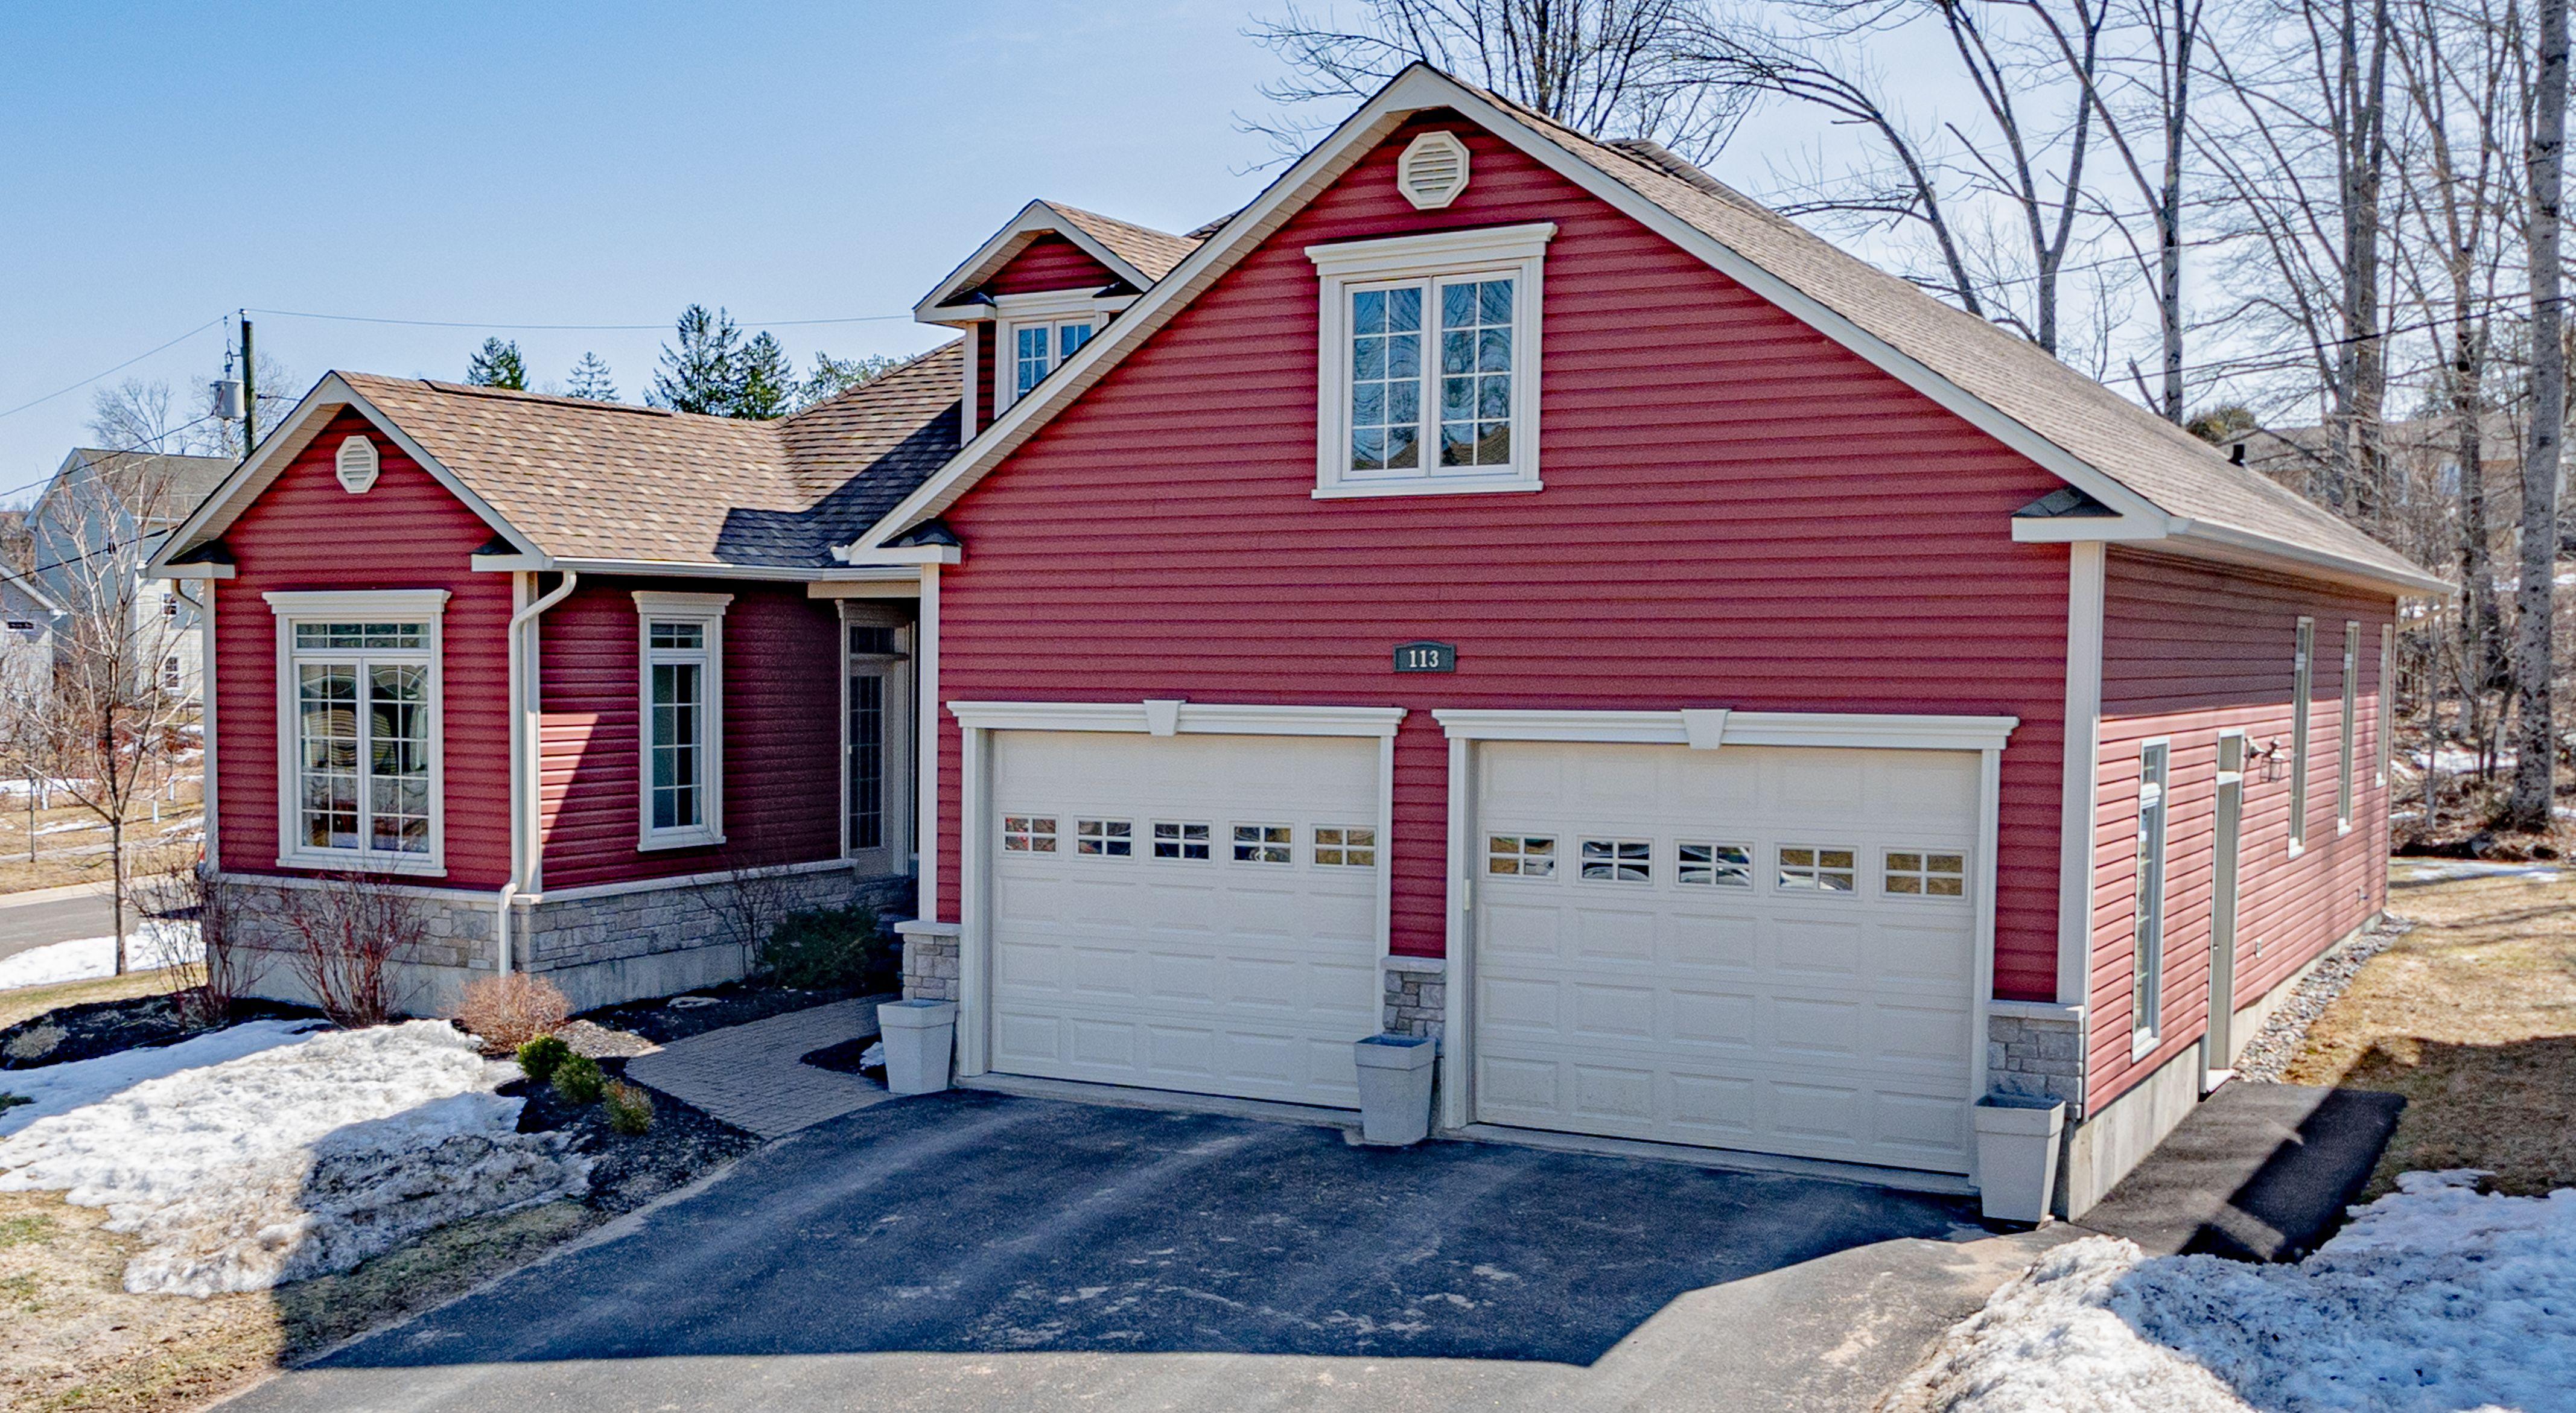 Fredericton House for sale:  3 bedroom  Stainless Steel Appliances, Glass Shower, Hardwood Floors 1,800 sq.ft. (Listed 2021-03-30)